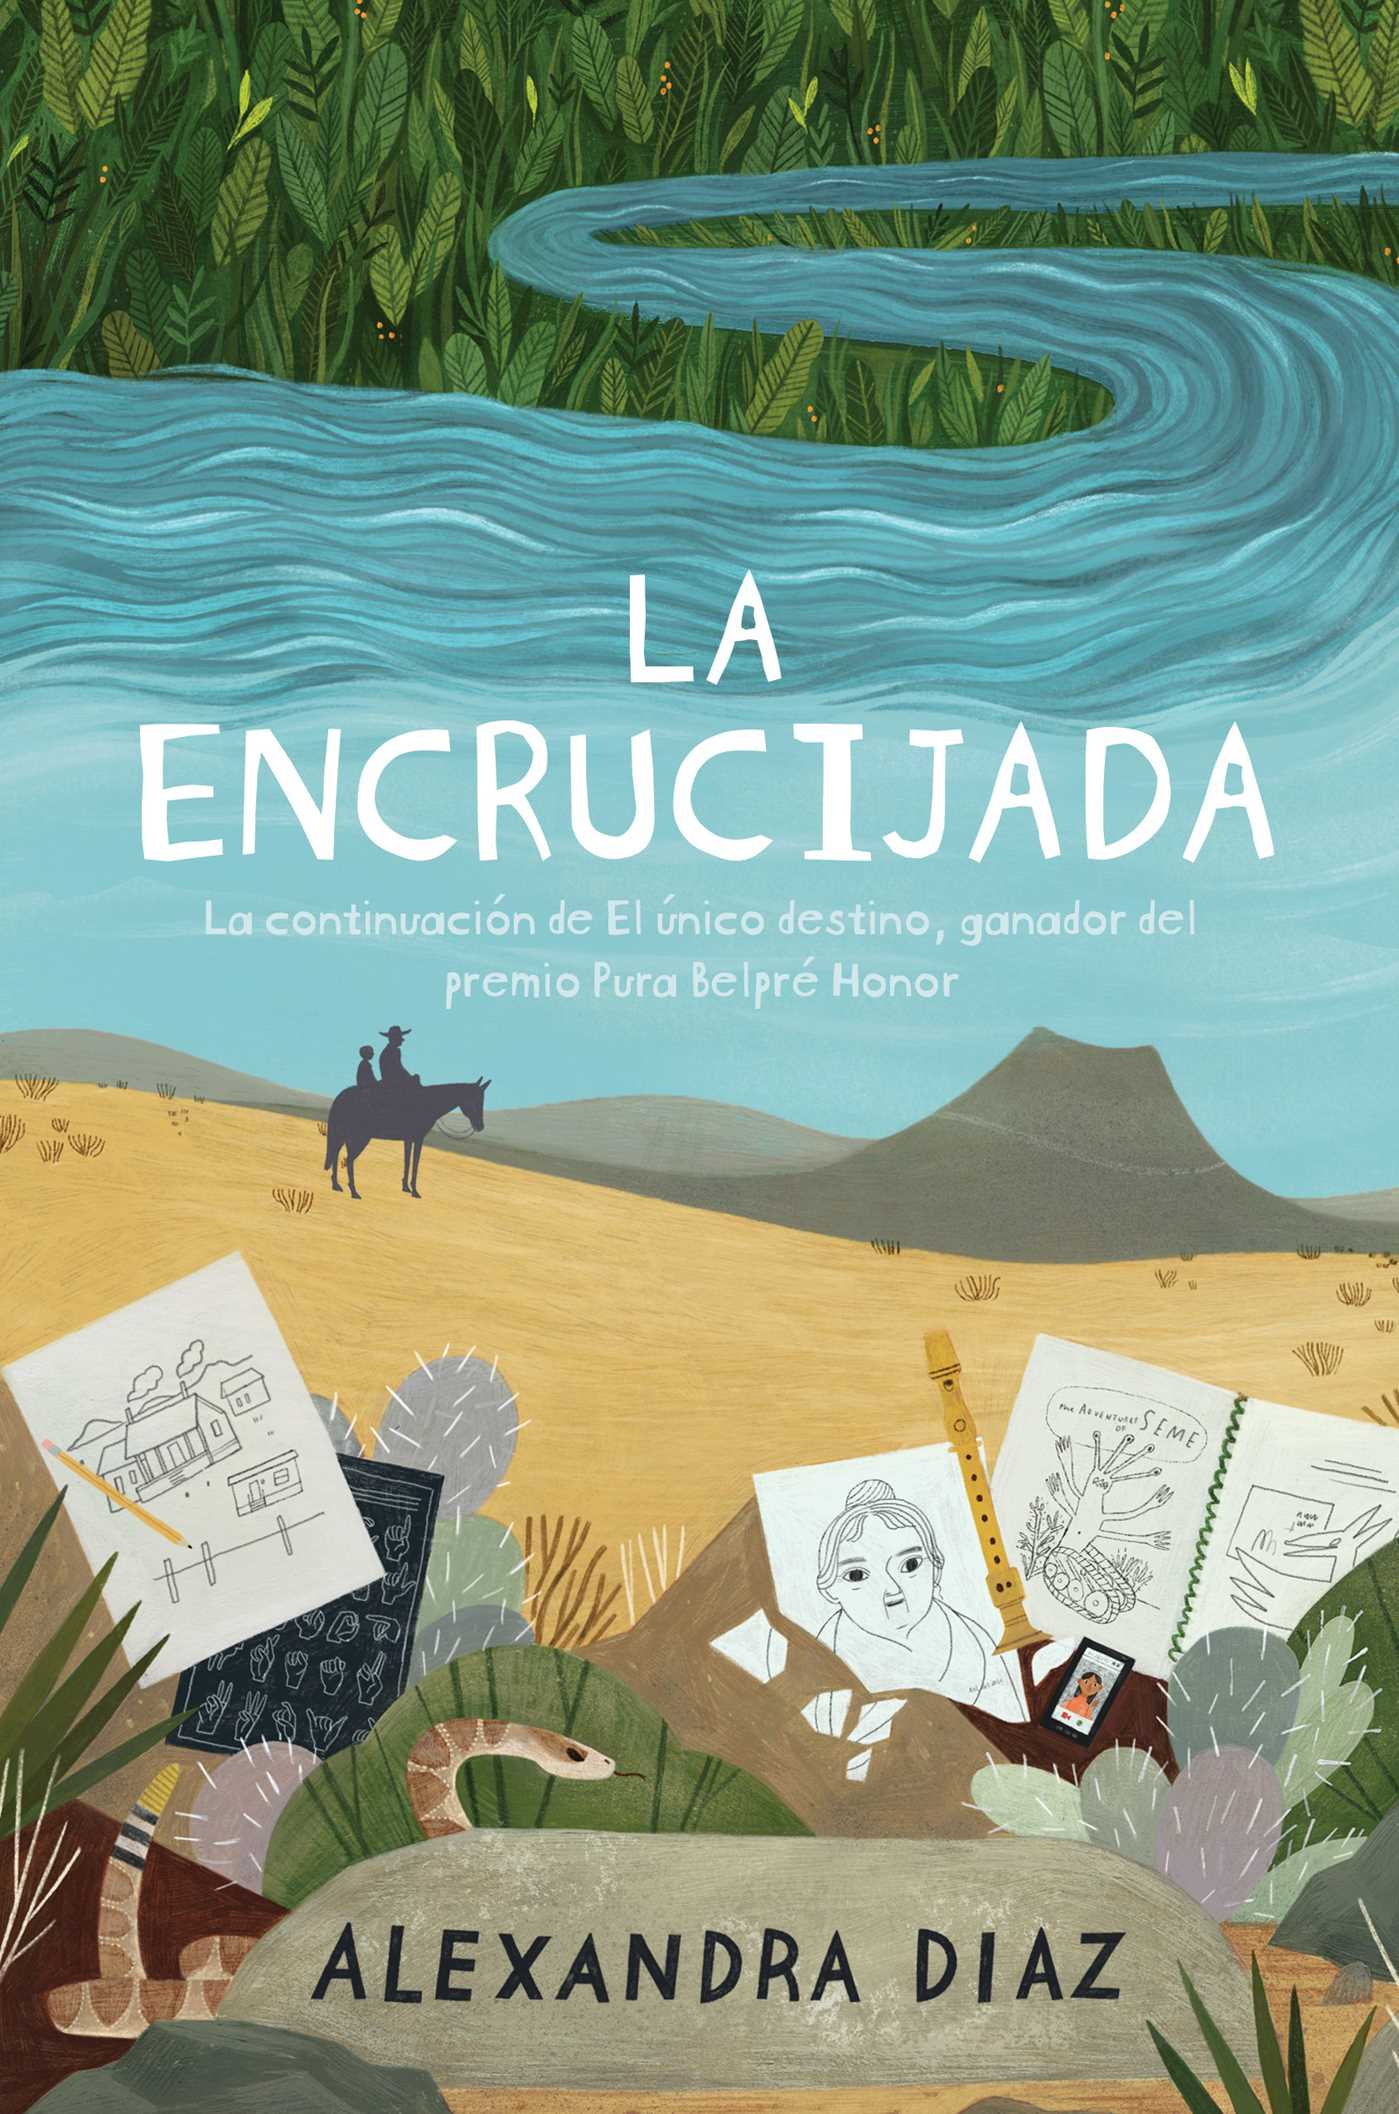 La encrucijada the crossroads 9781534429918 hr